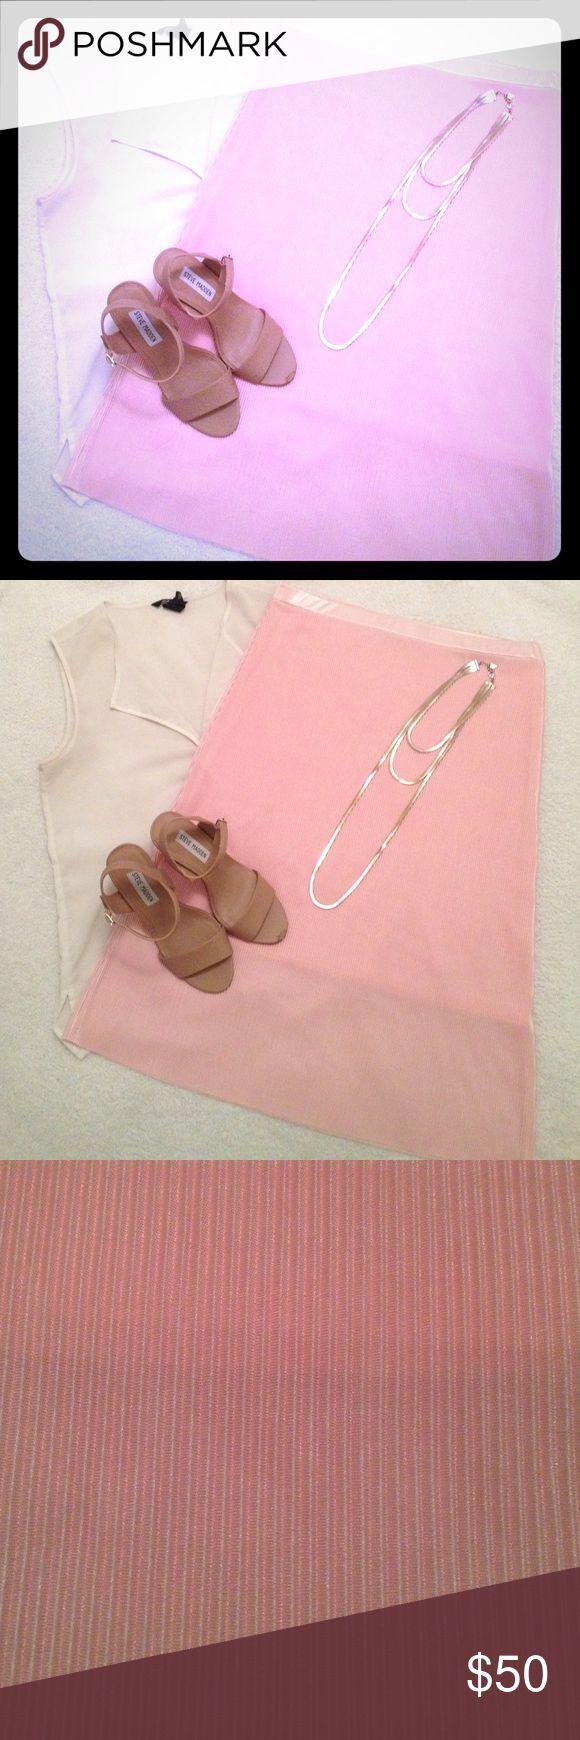 Liz Claiborne Skirt Light pink skirt, very cute, never worn. White top on sale as well Liz Claiborne Skirts Midi